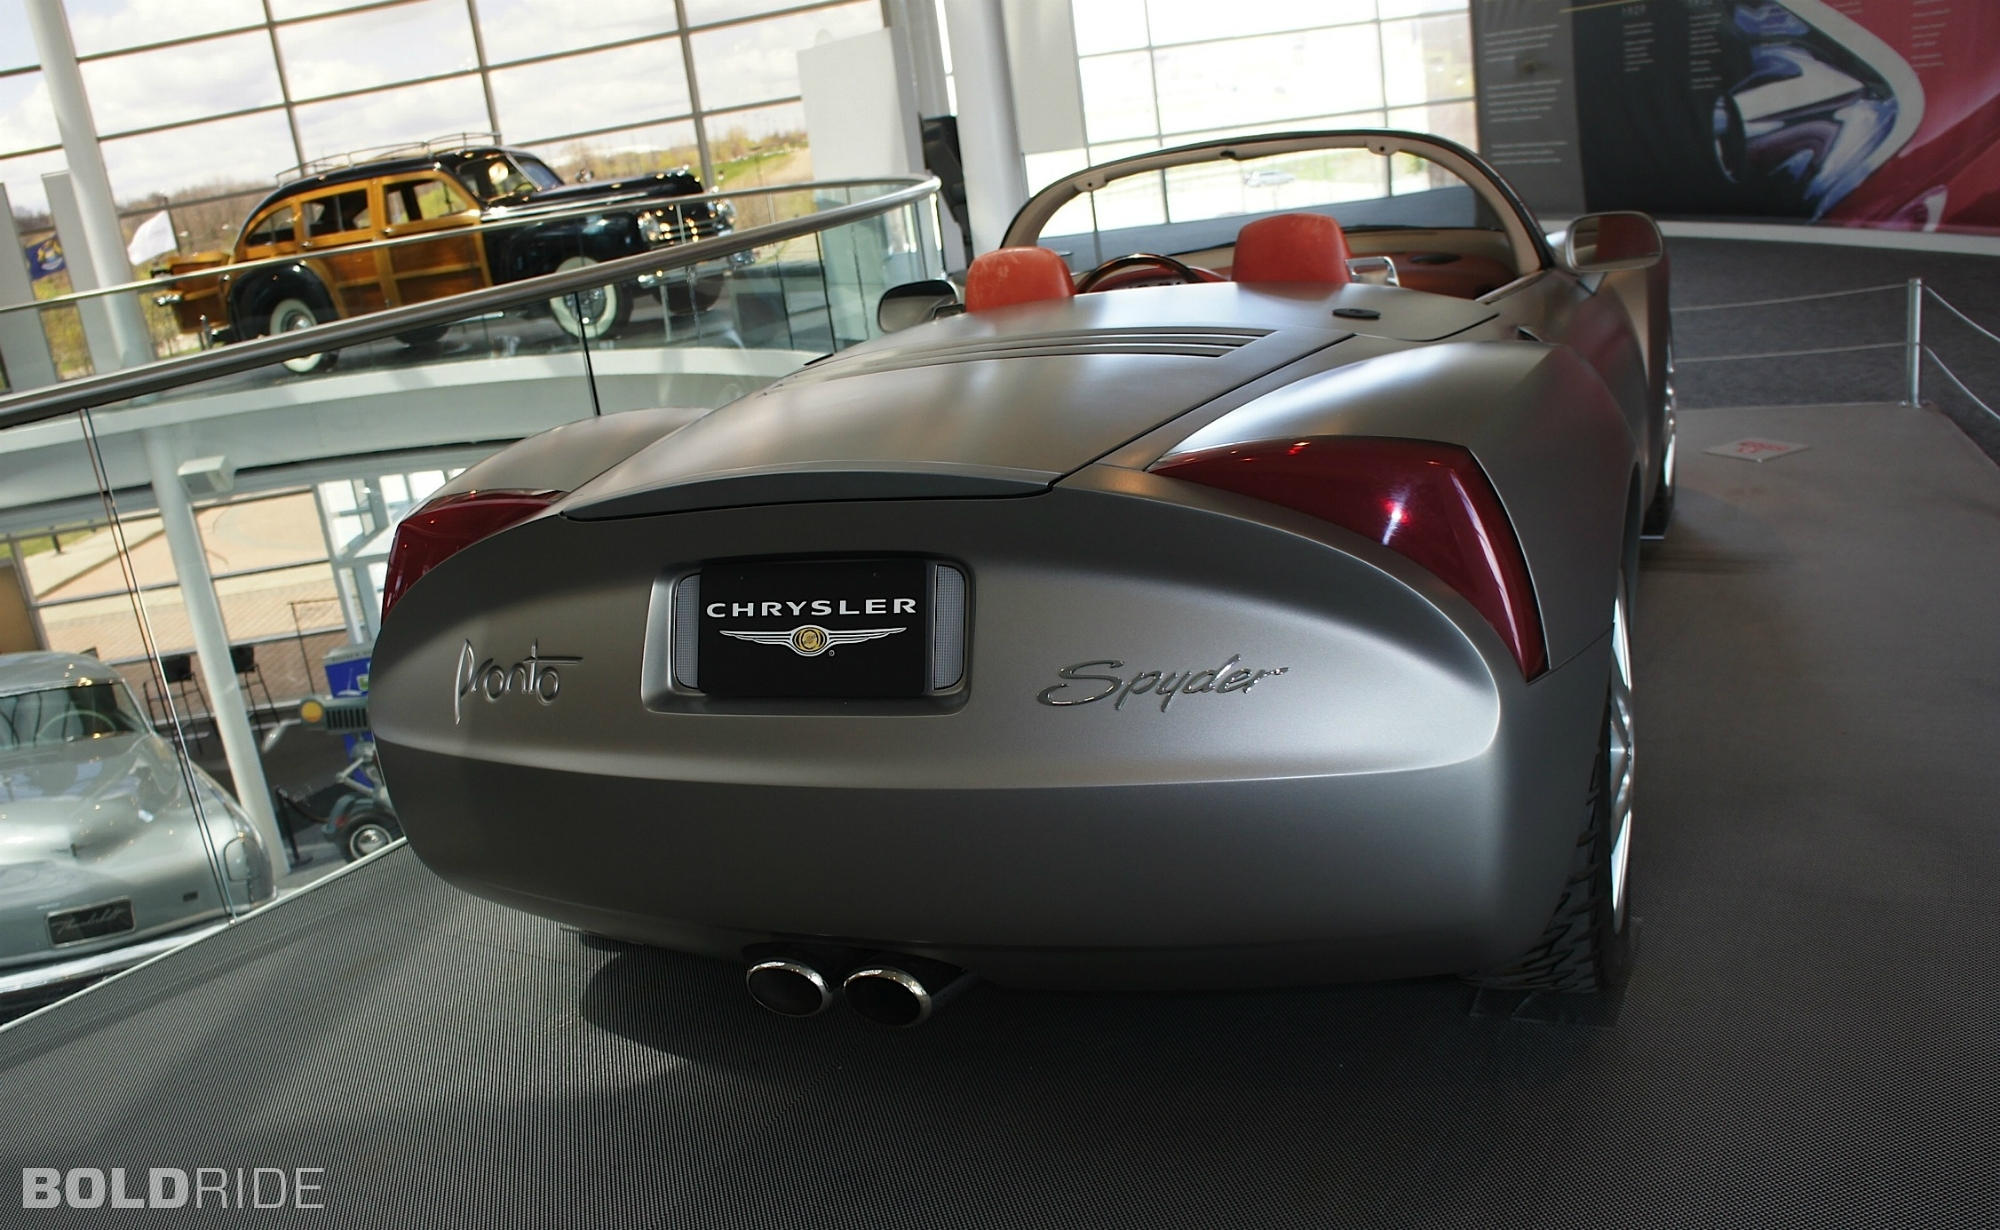 Plymouth Pronto Spyder